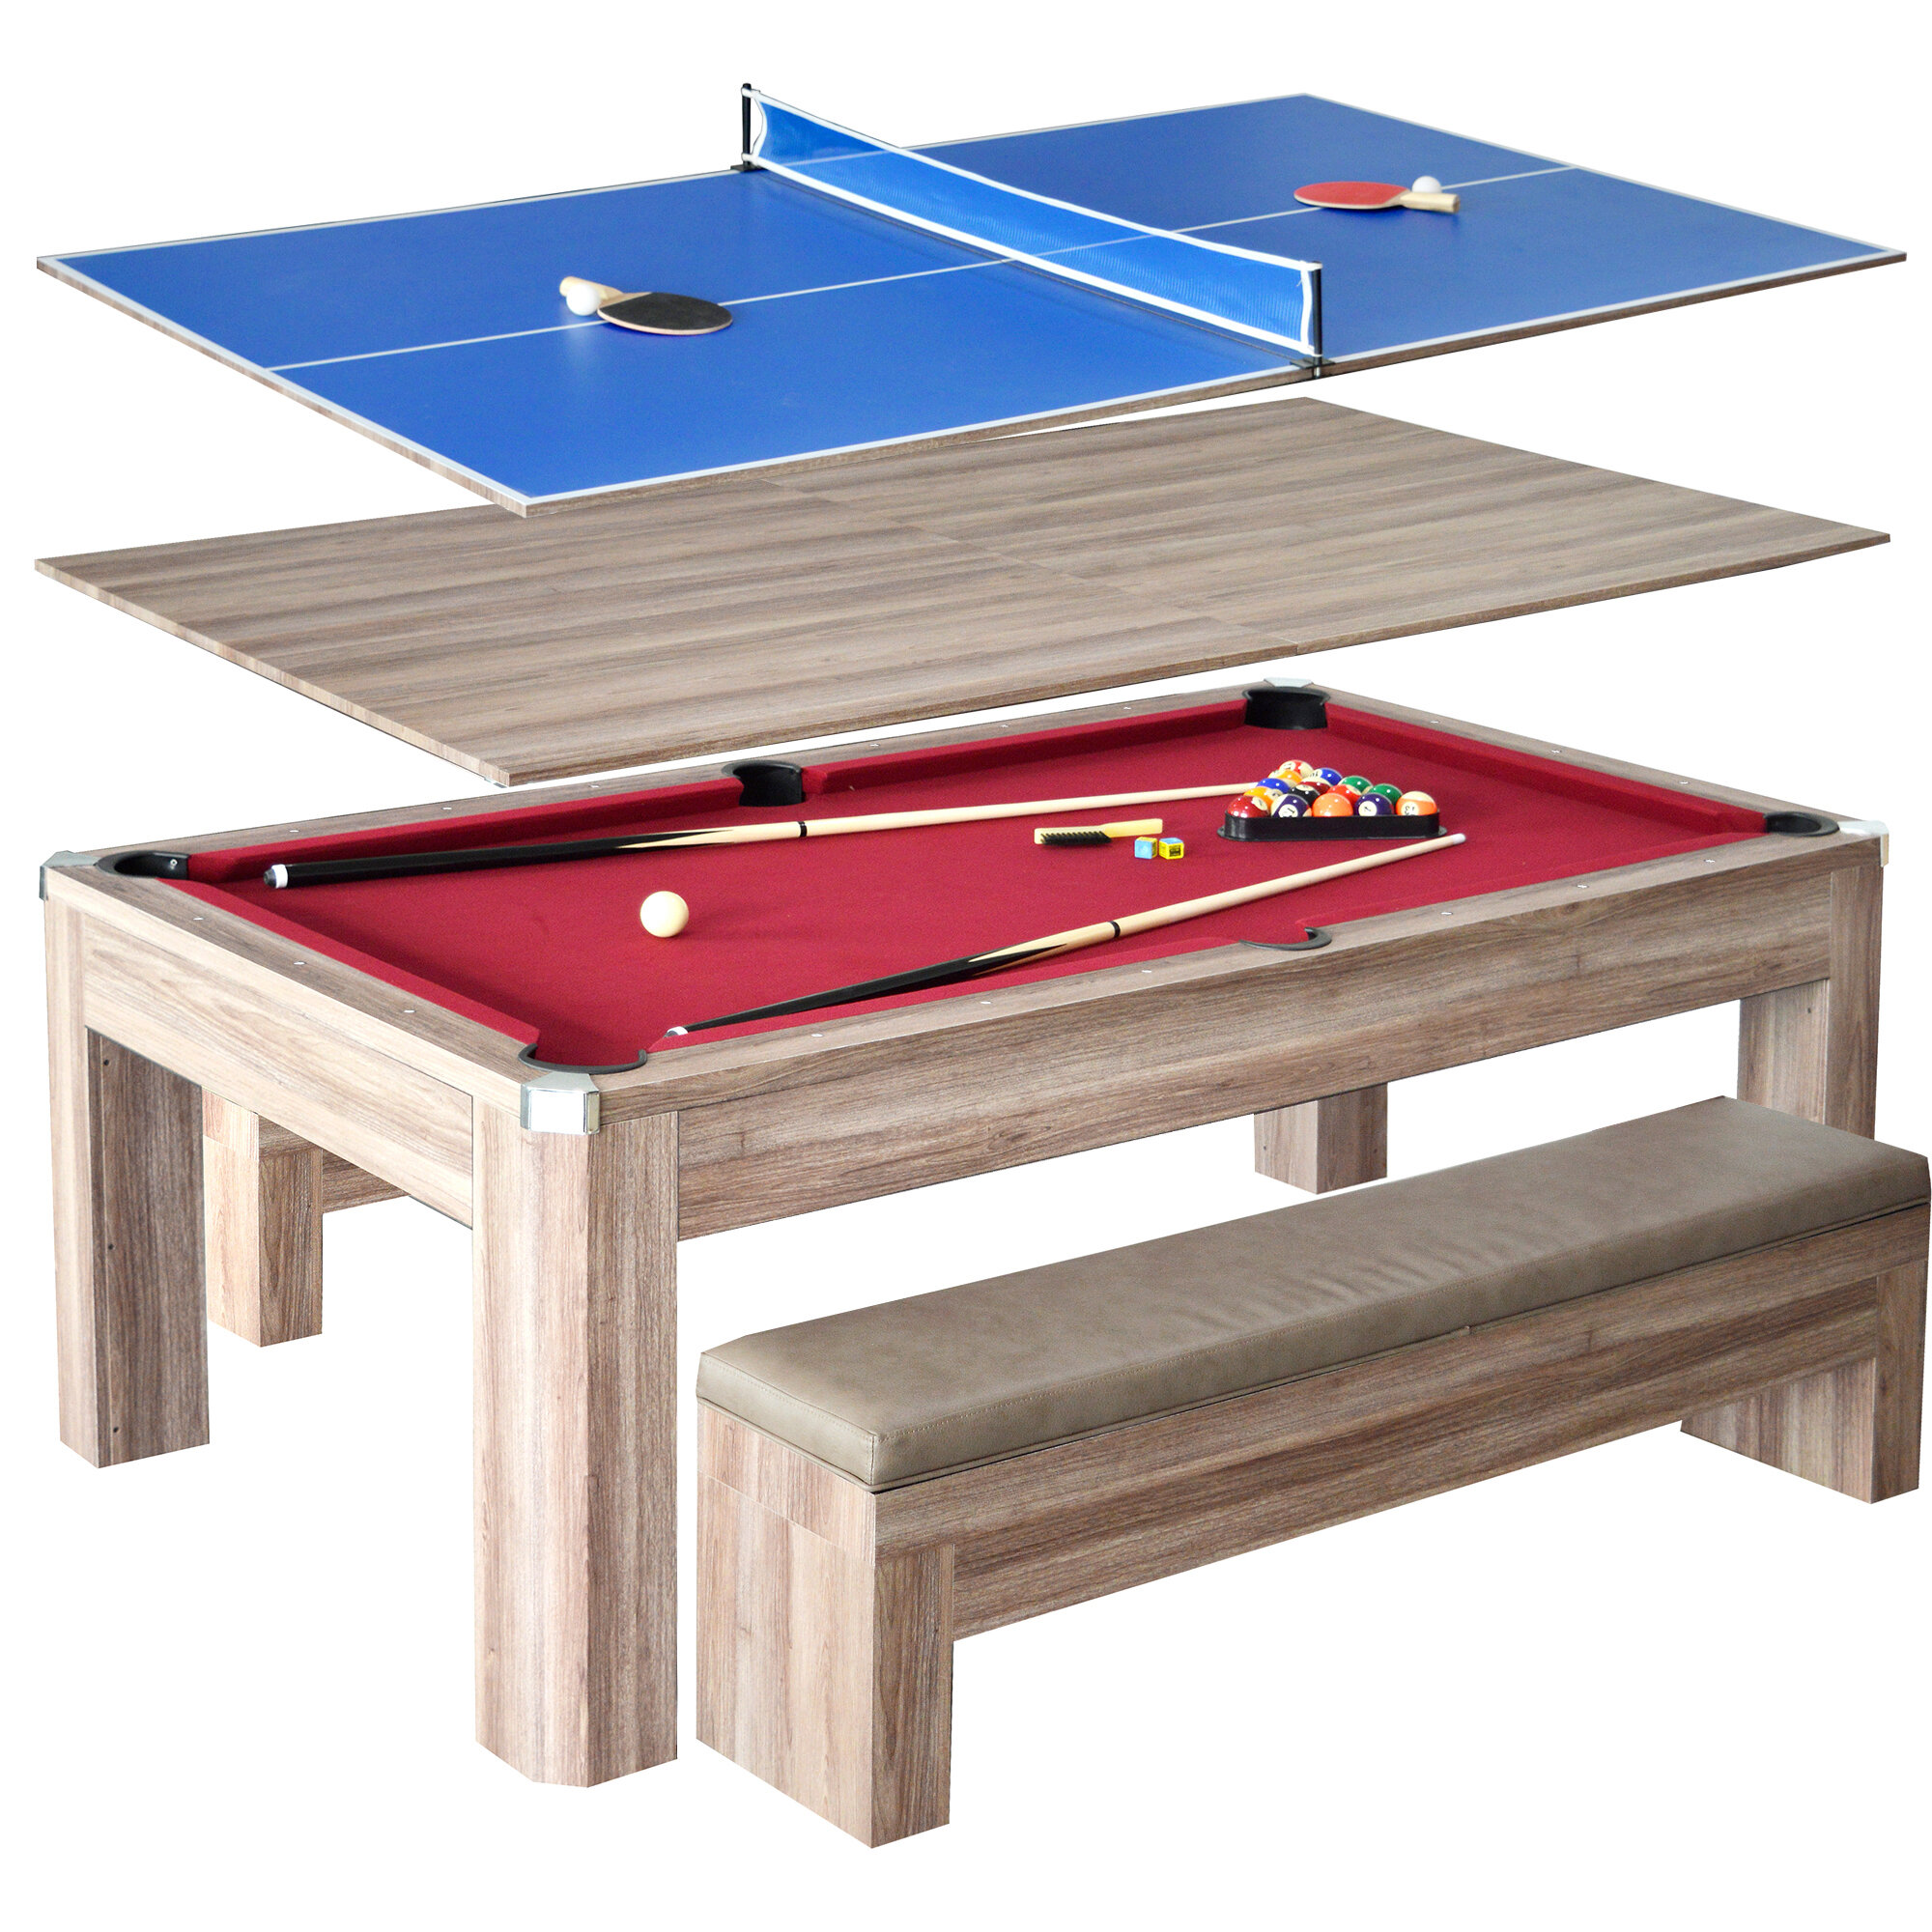 Hathaway Games Newport 7u0027 Rotating Game Table U0026 Reviews | Wayfair